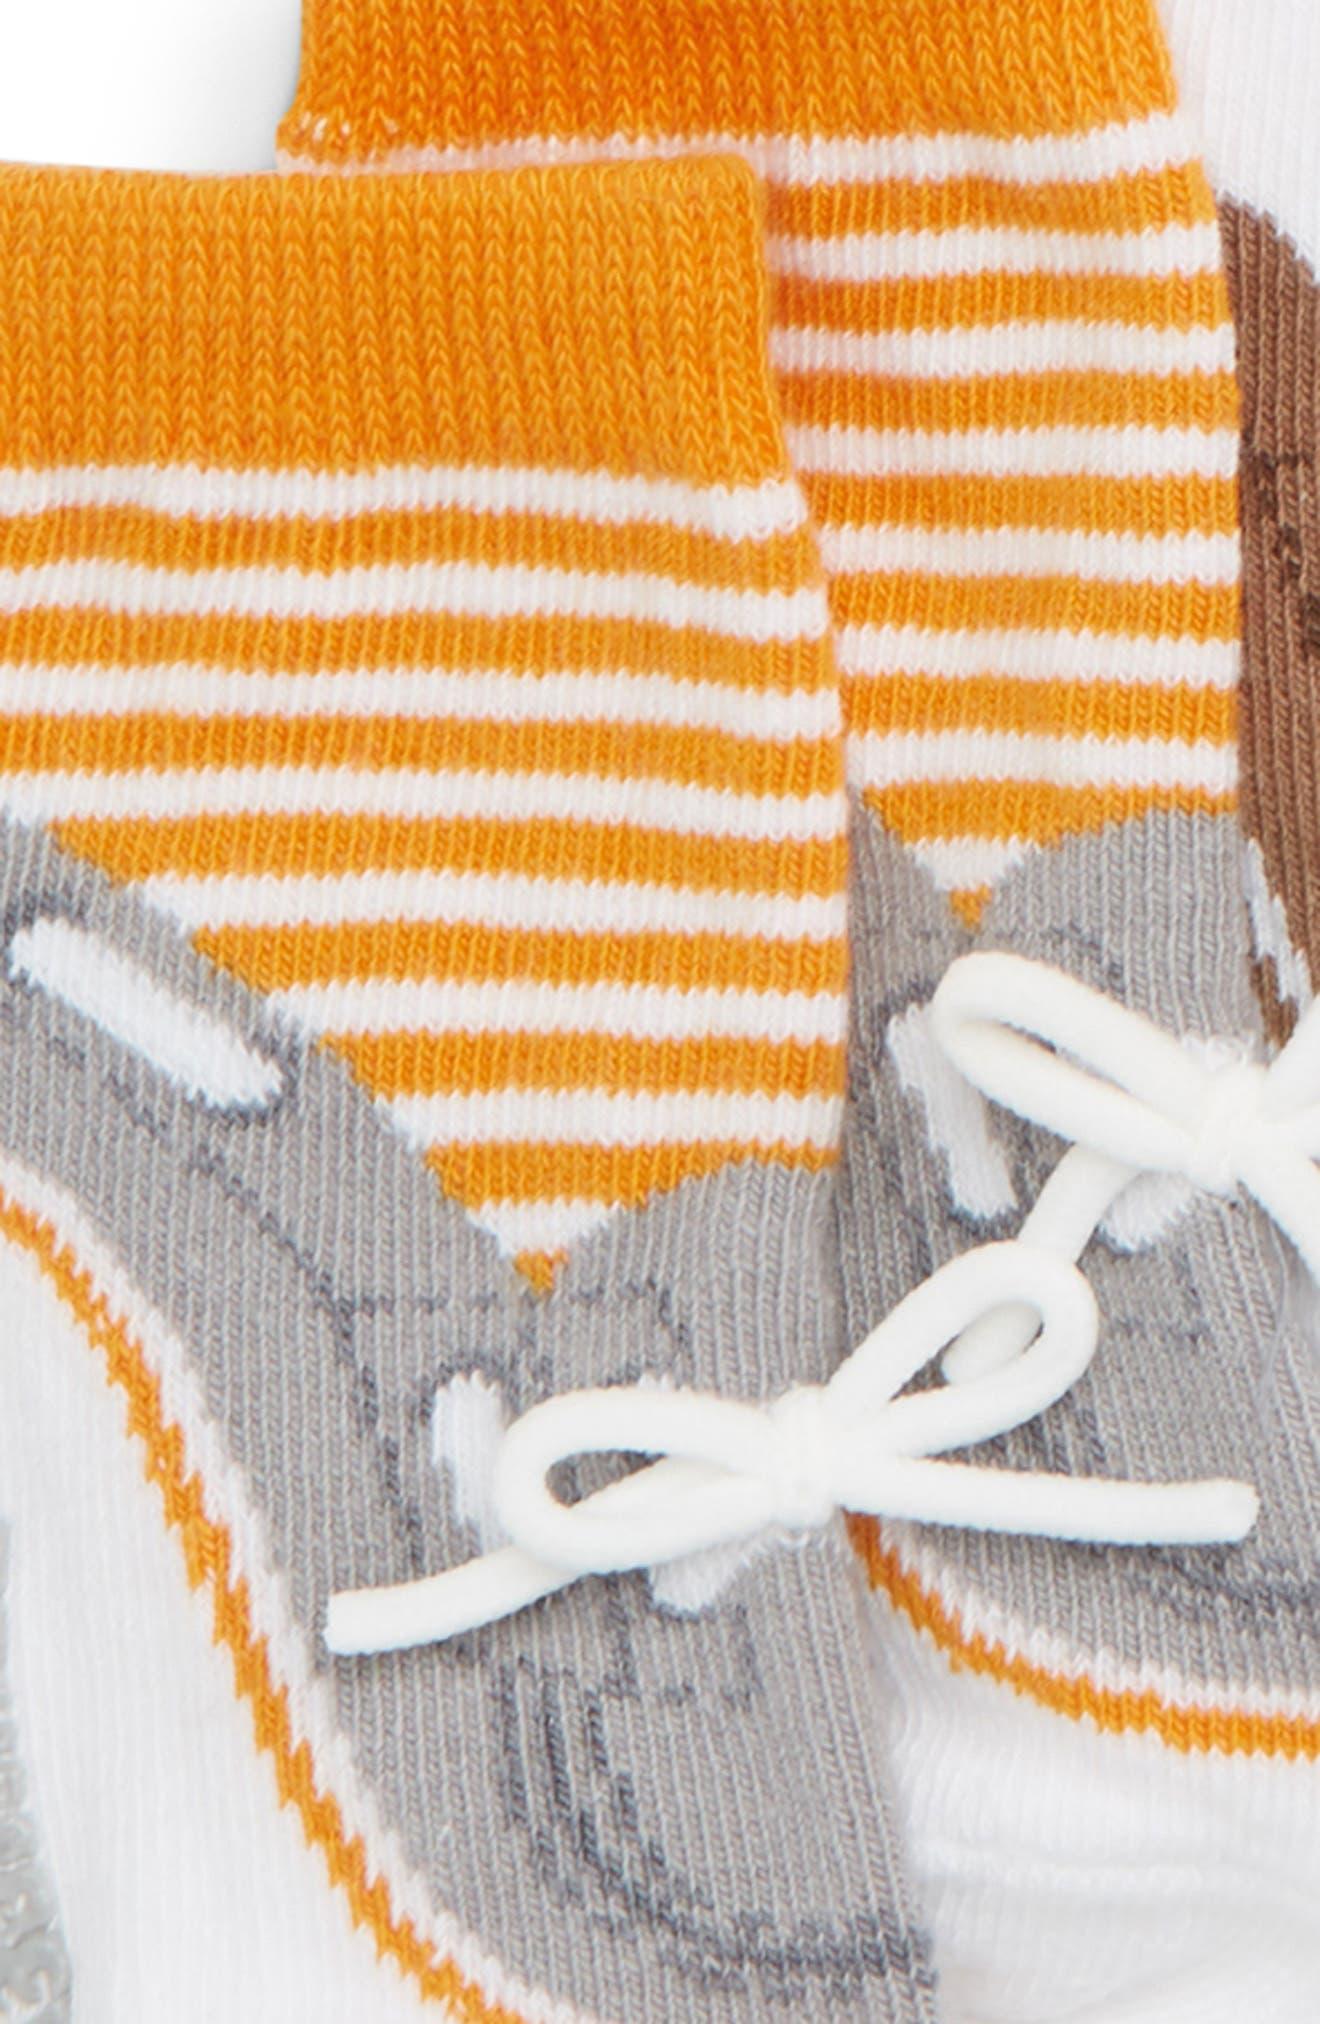 Noah 6-Pack Socks,                             Alternate thumbnail 3, color,                             ASSORTED NEUTRAL